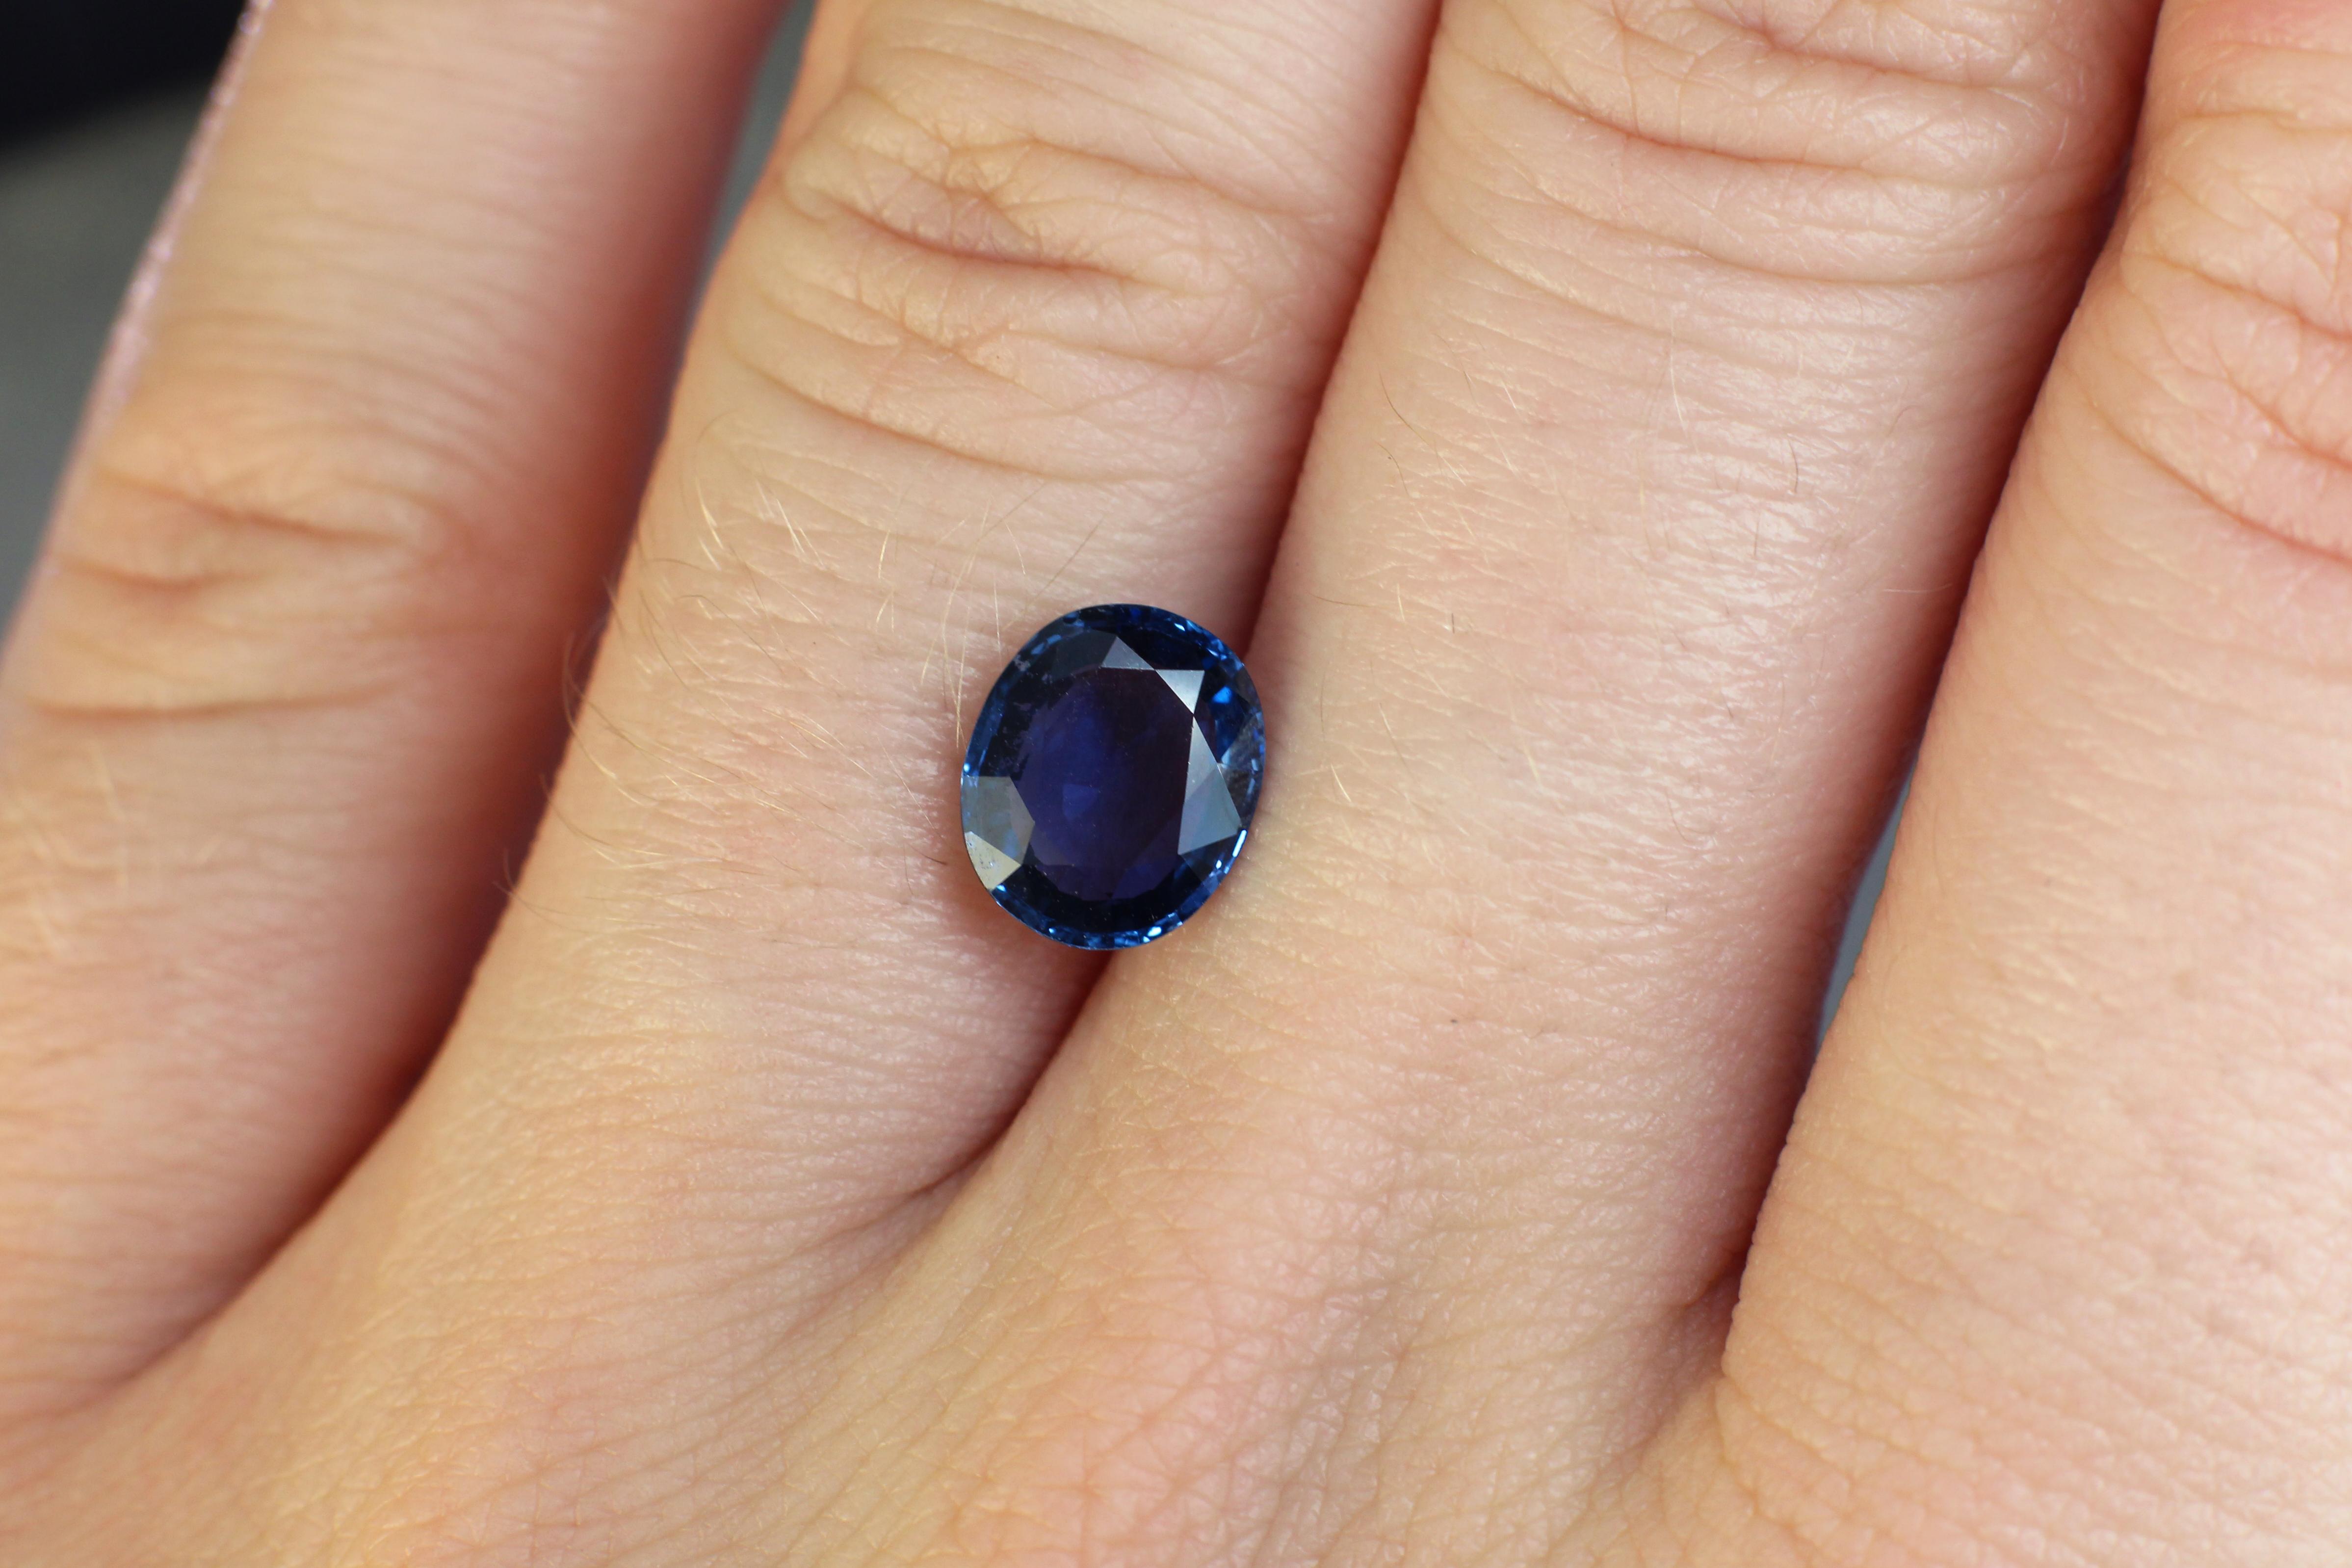 1.87 ct violetish blue oval sapphire